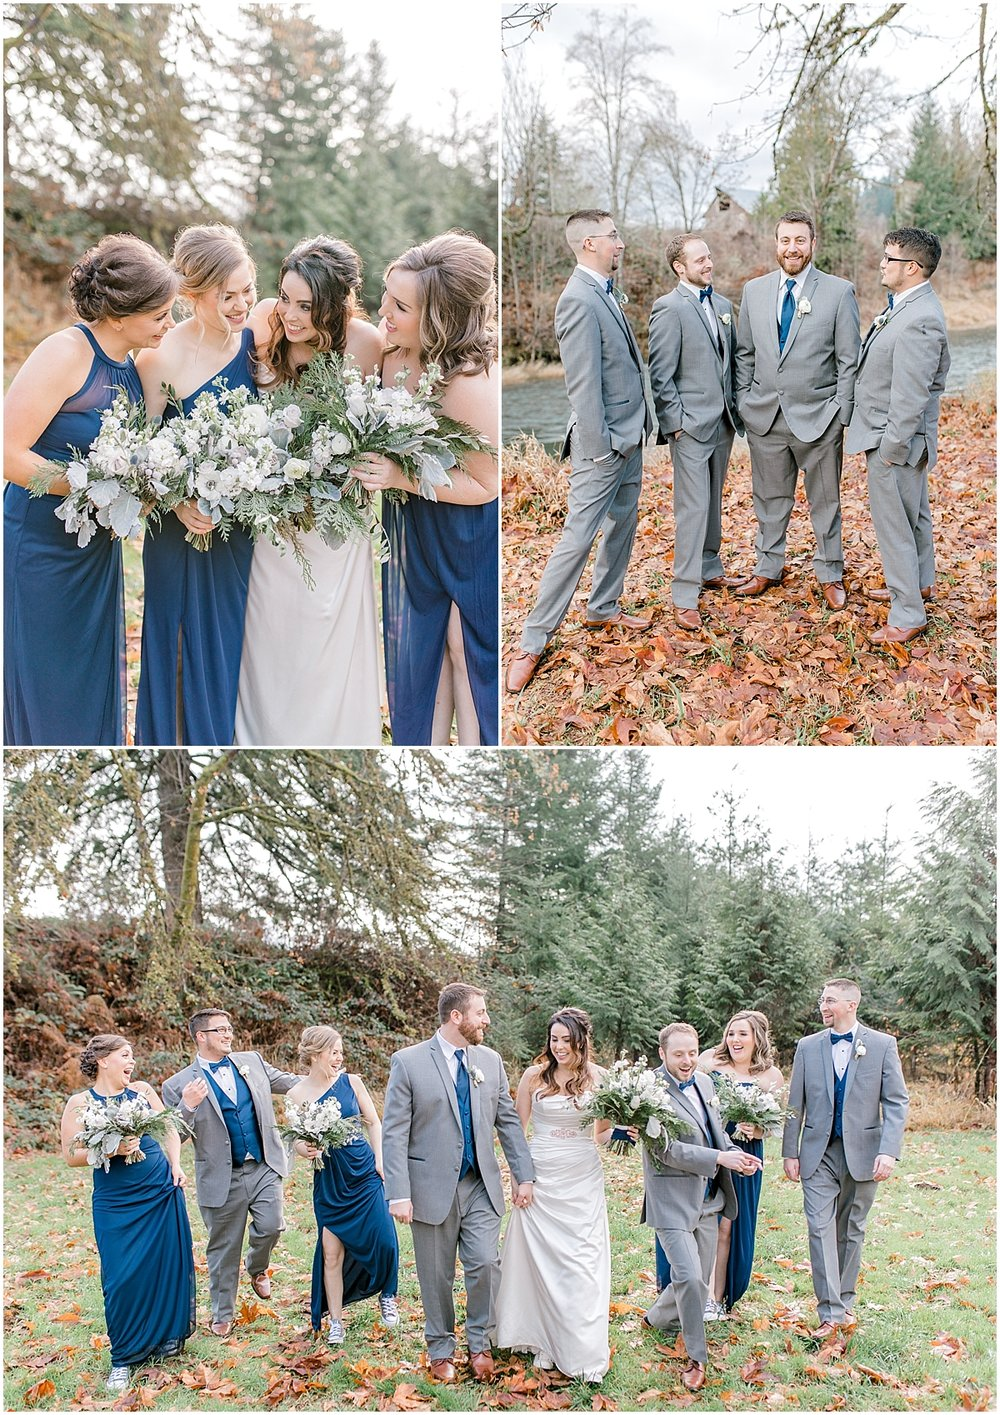 Chehalis Washington Winter Wedding Silver and White | Willapa Hills Farm Wedding | Eastham | Emma Rose Company PNW Light and Airy Wedding Photographer_0028.jpg